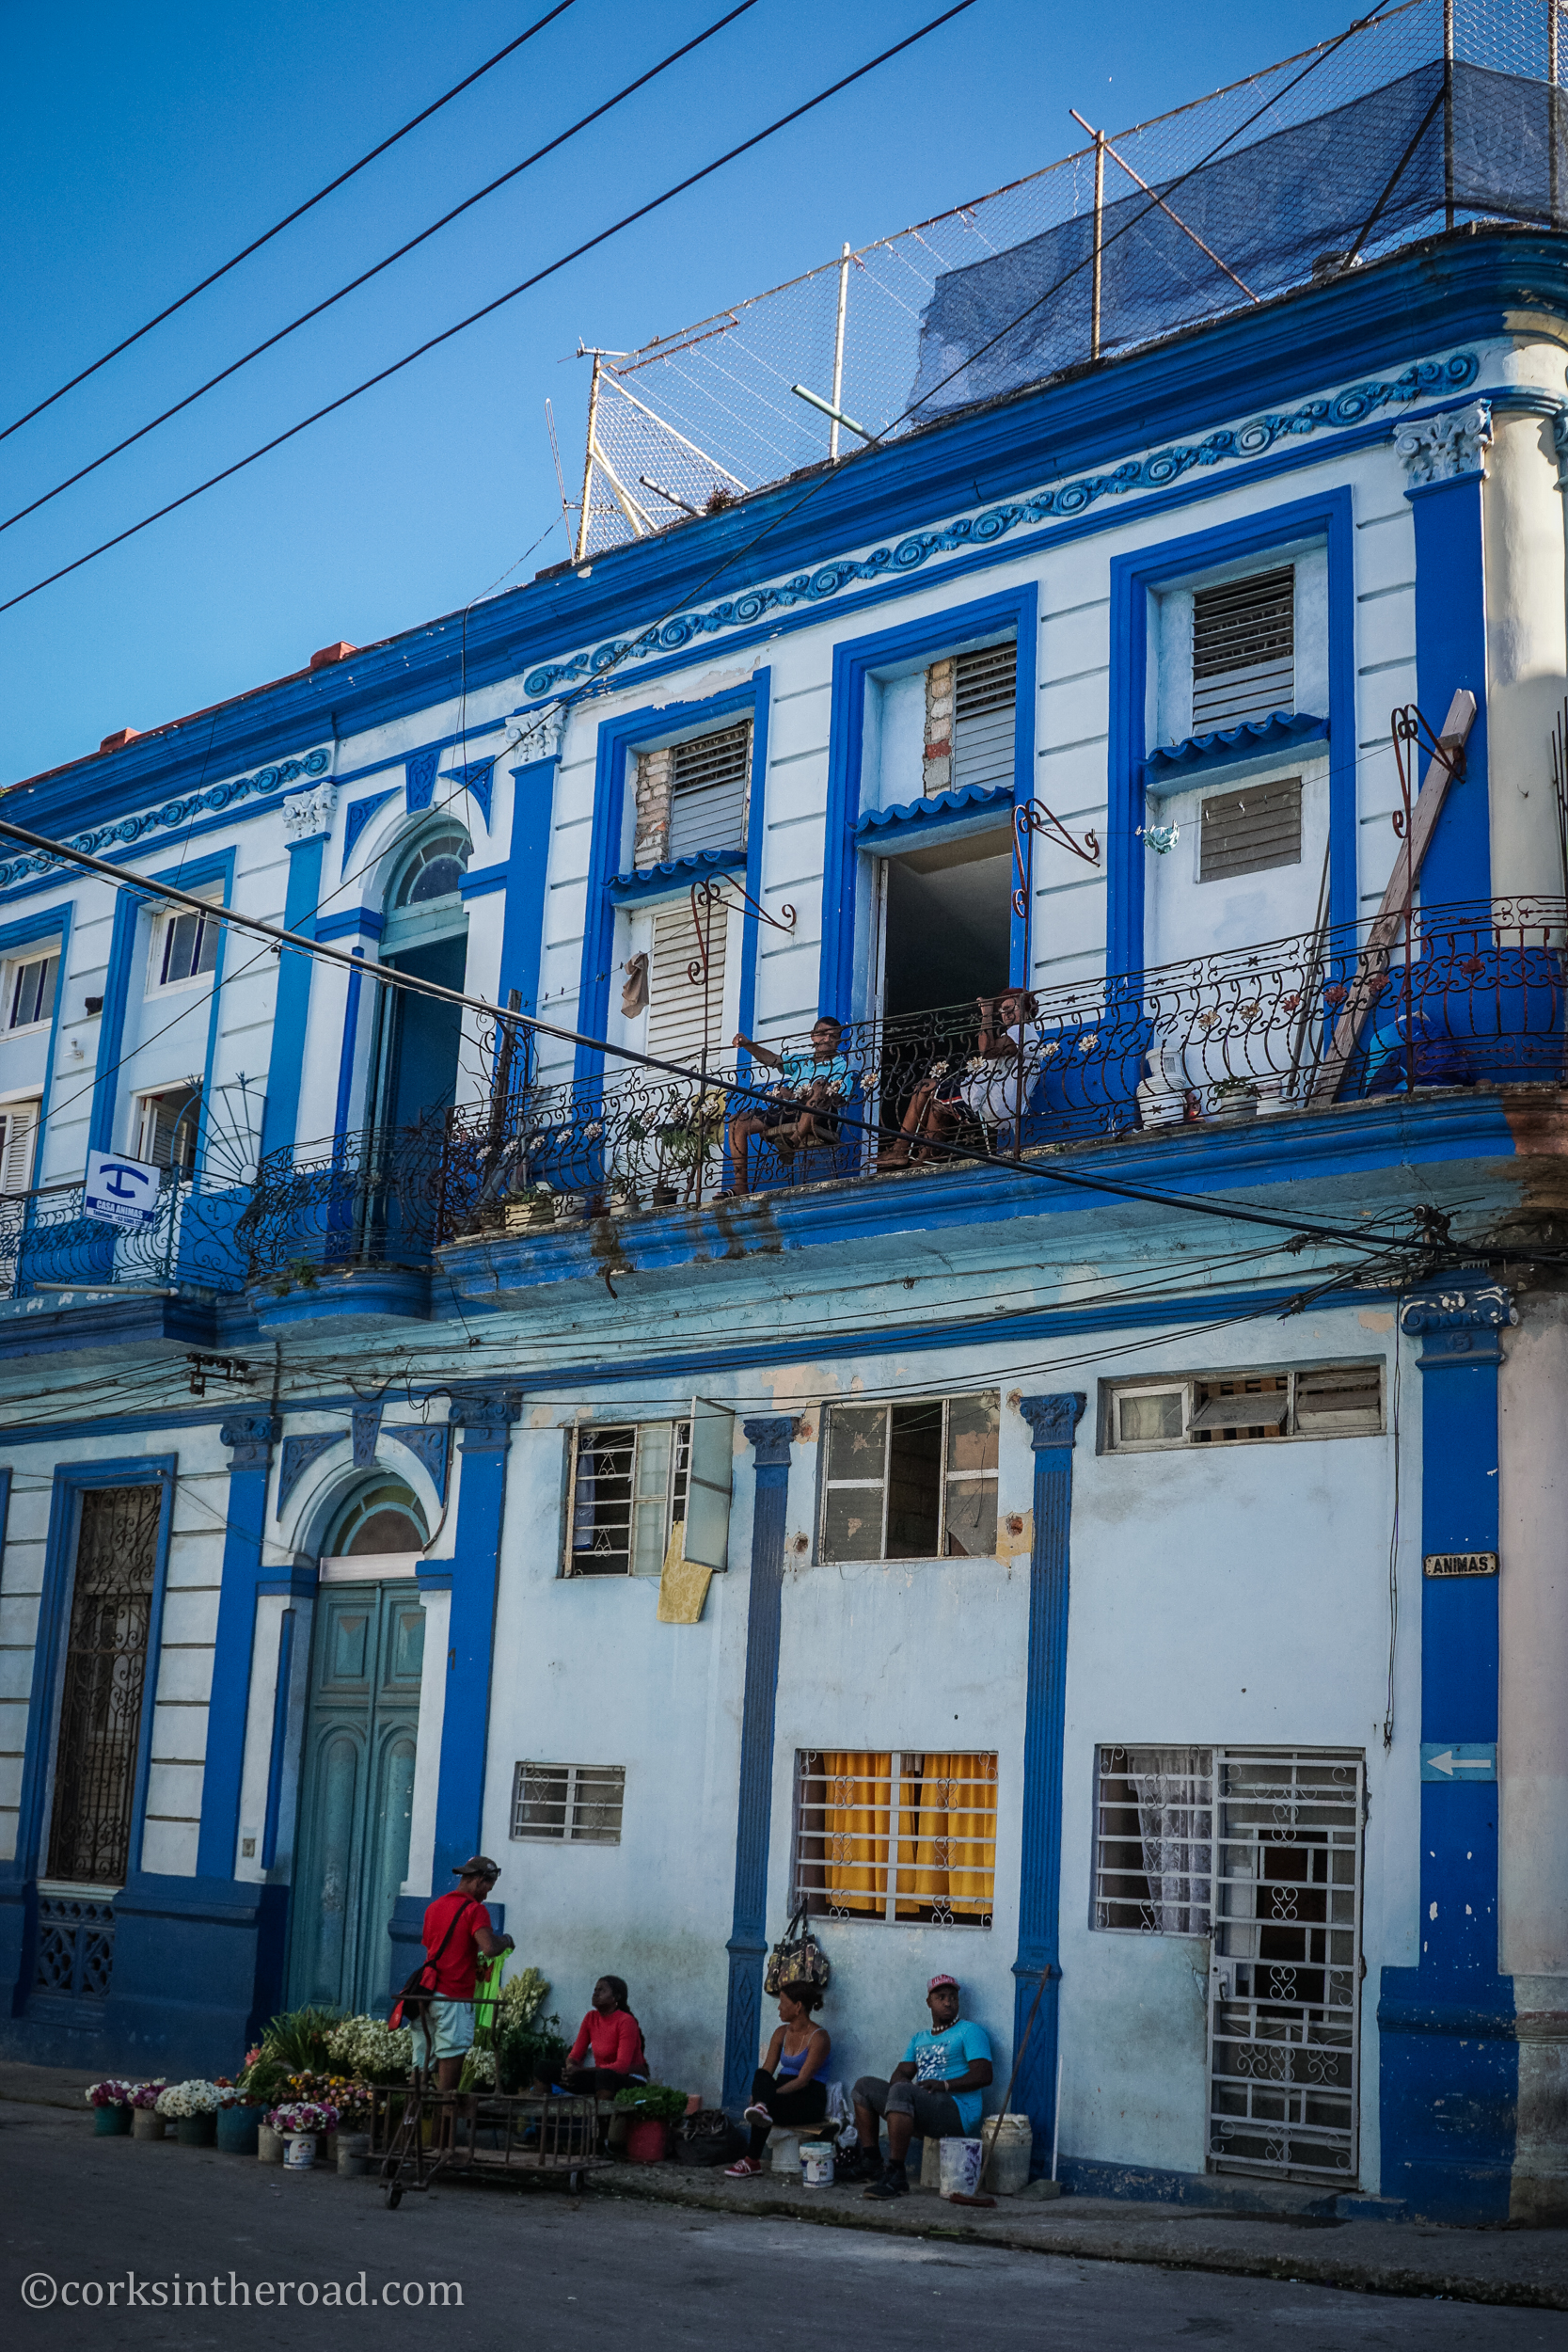 Architecture, Corksintheroad, Cuba, Havana-4.jpg